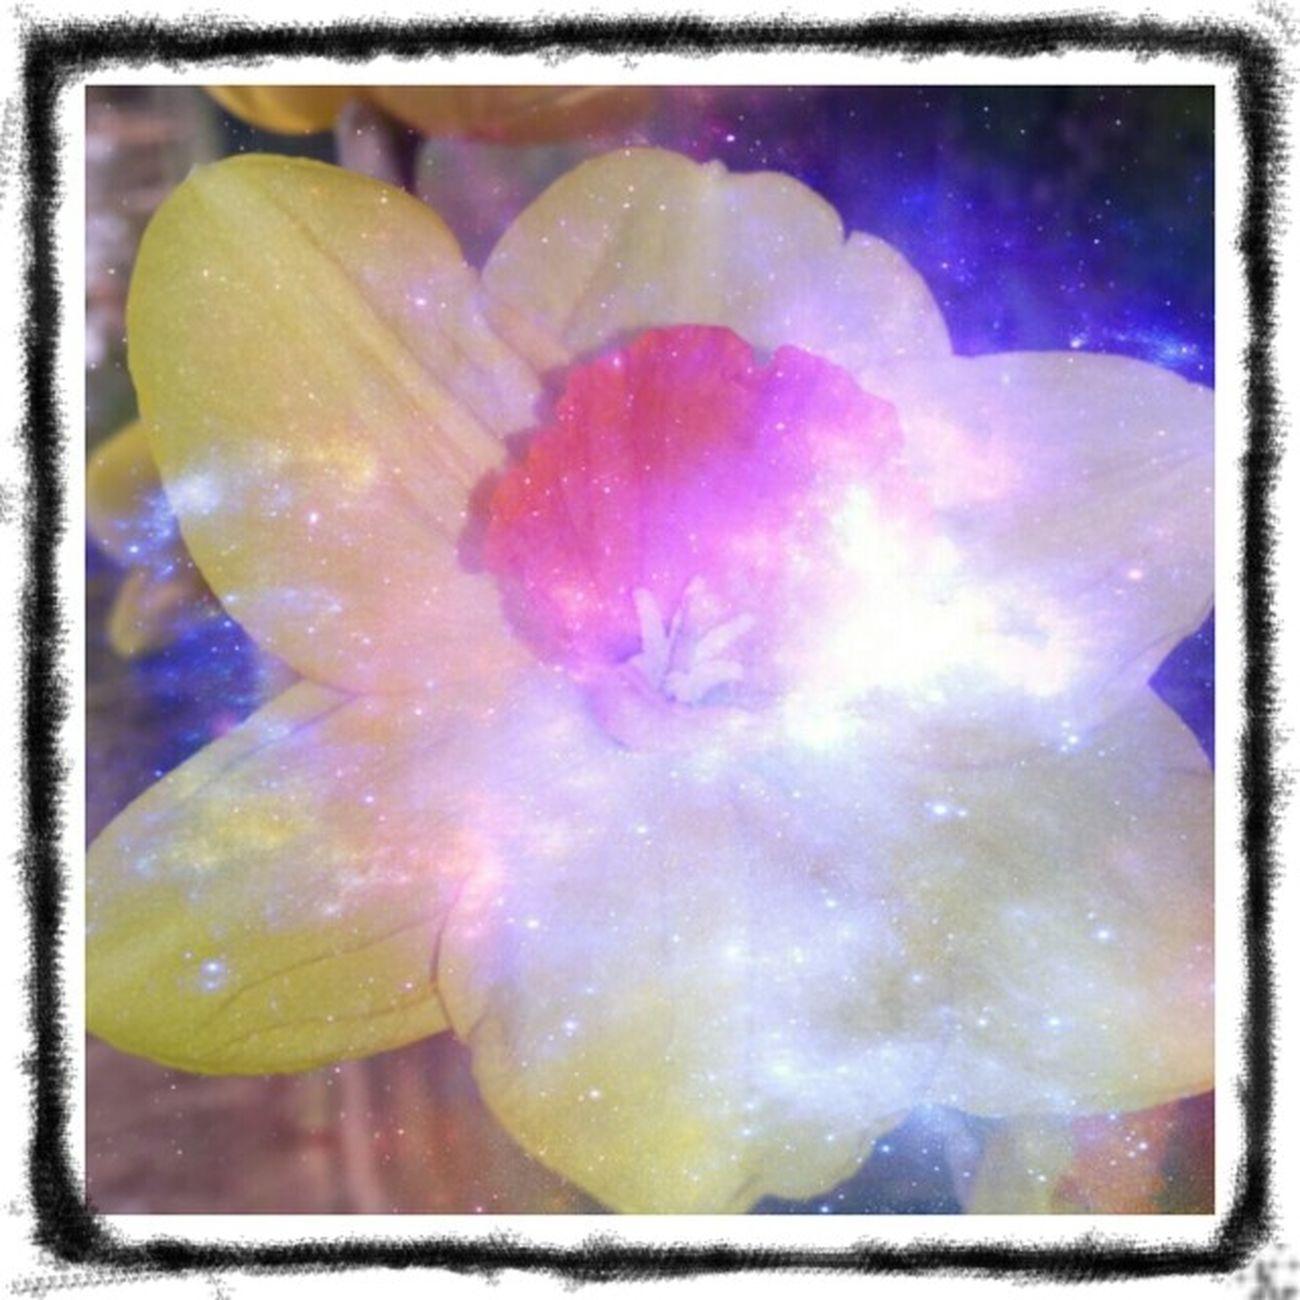 This is my thank you Flower Art Instagram #followme #follow #eyeem #awesome #streamzoo #instahub #photo #sigueme #followhim #cute #follow4follow F4f Followback [ Heartflowers Flower Power floweholic BloomingGreat flowerstream streamzooville